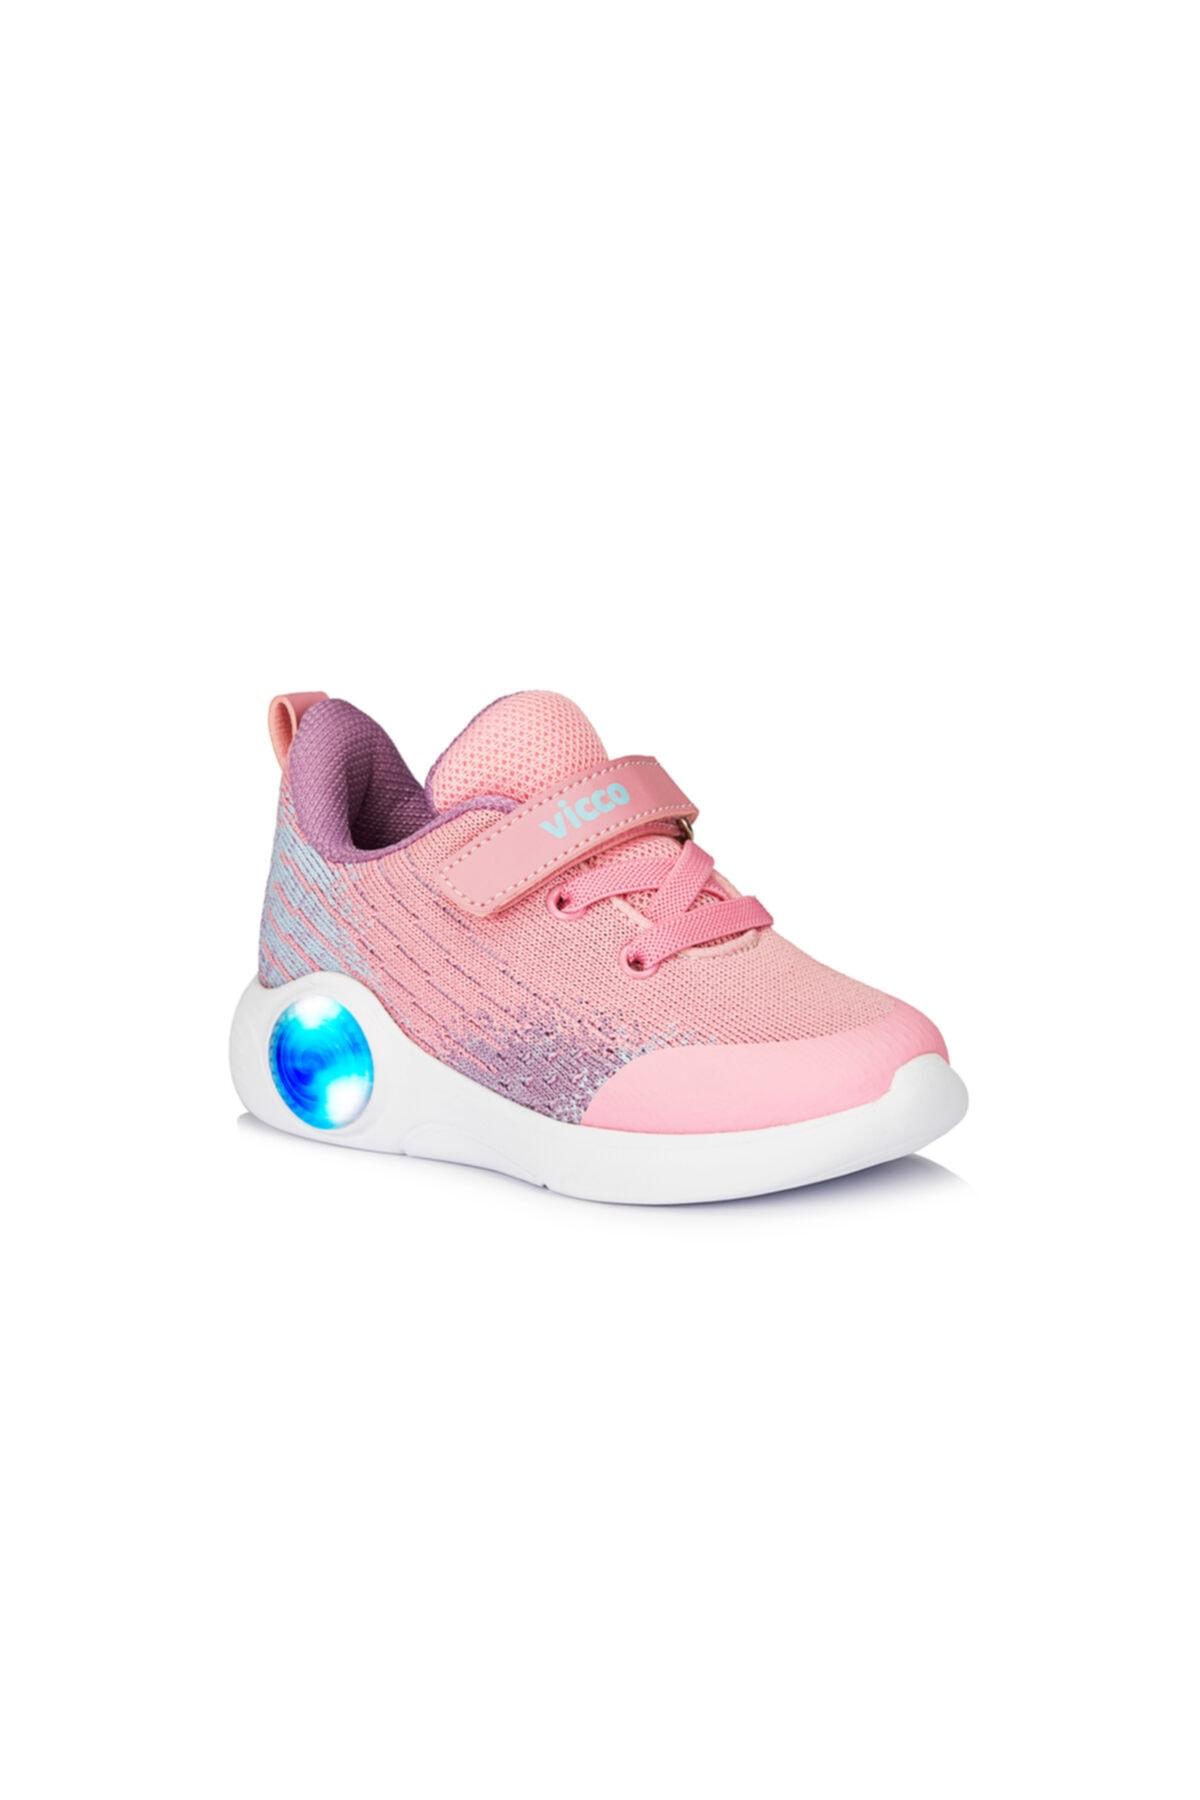 Vicco Kız Bebek Neo Pembe Spor Ayakkabı 1